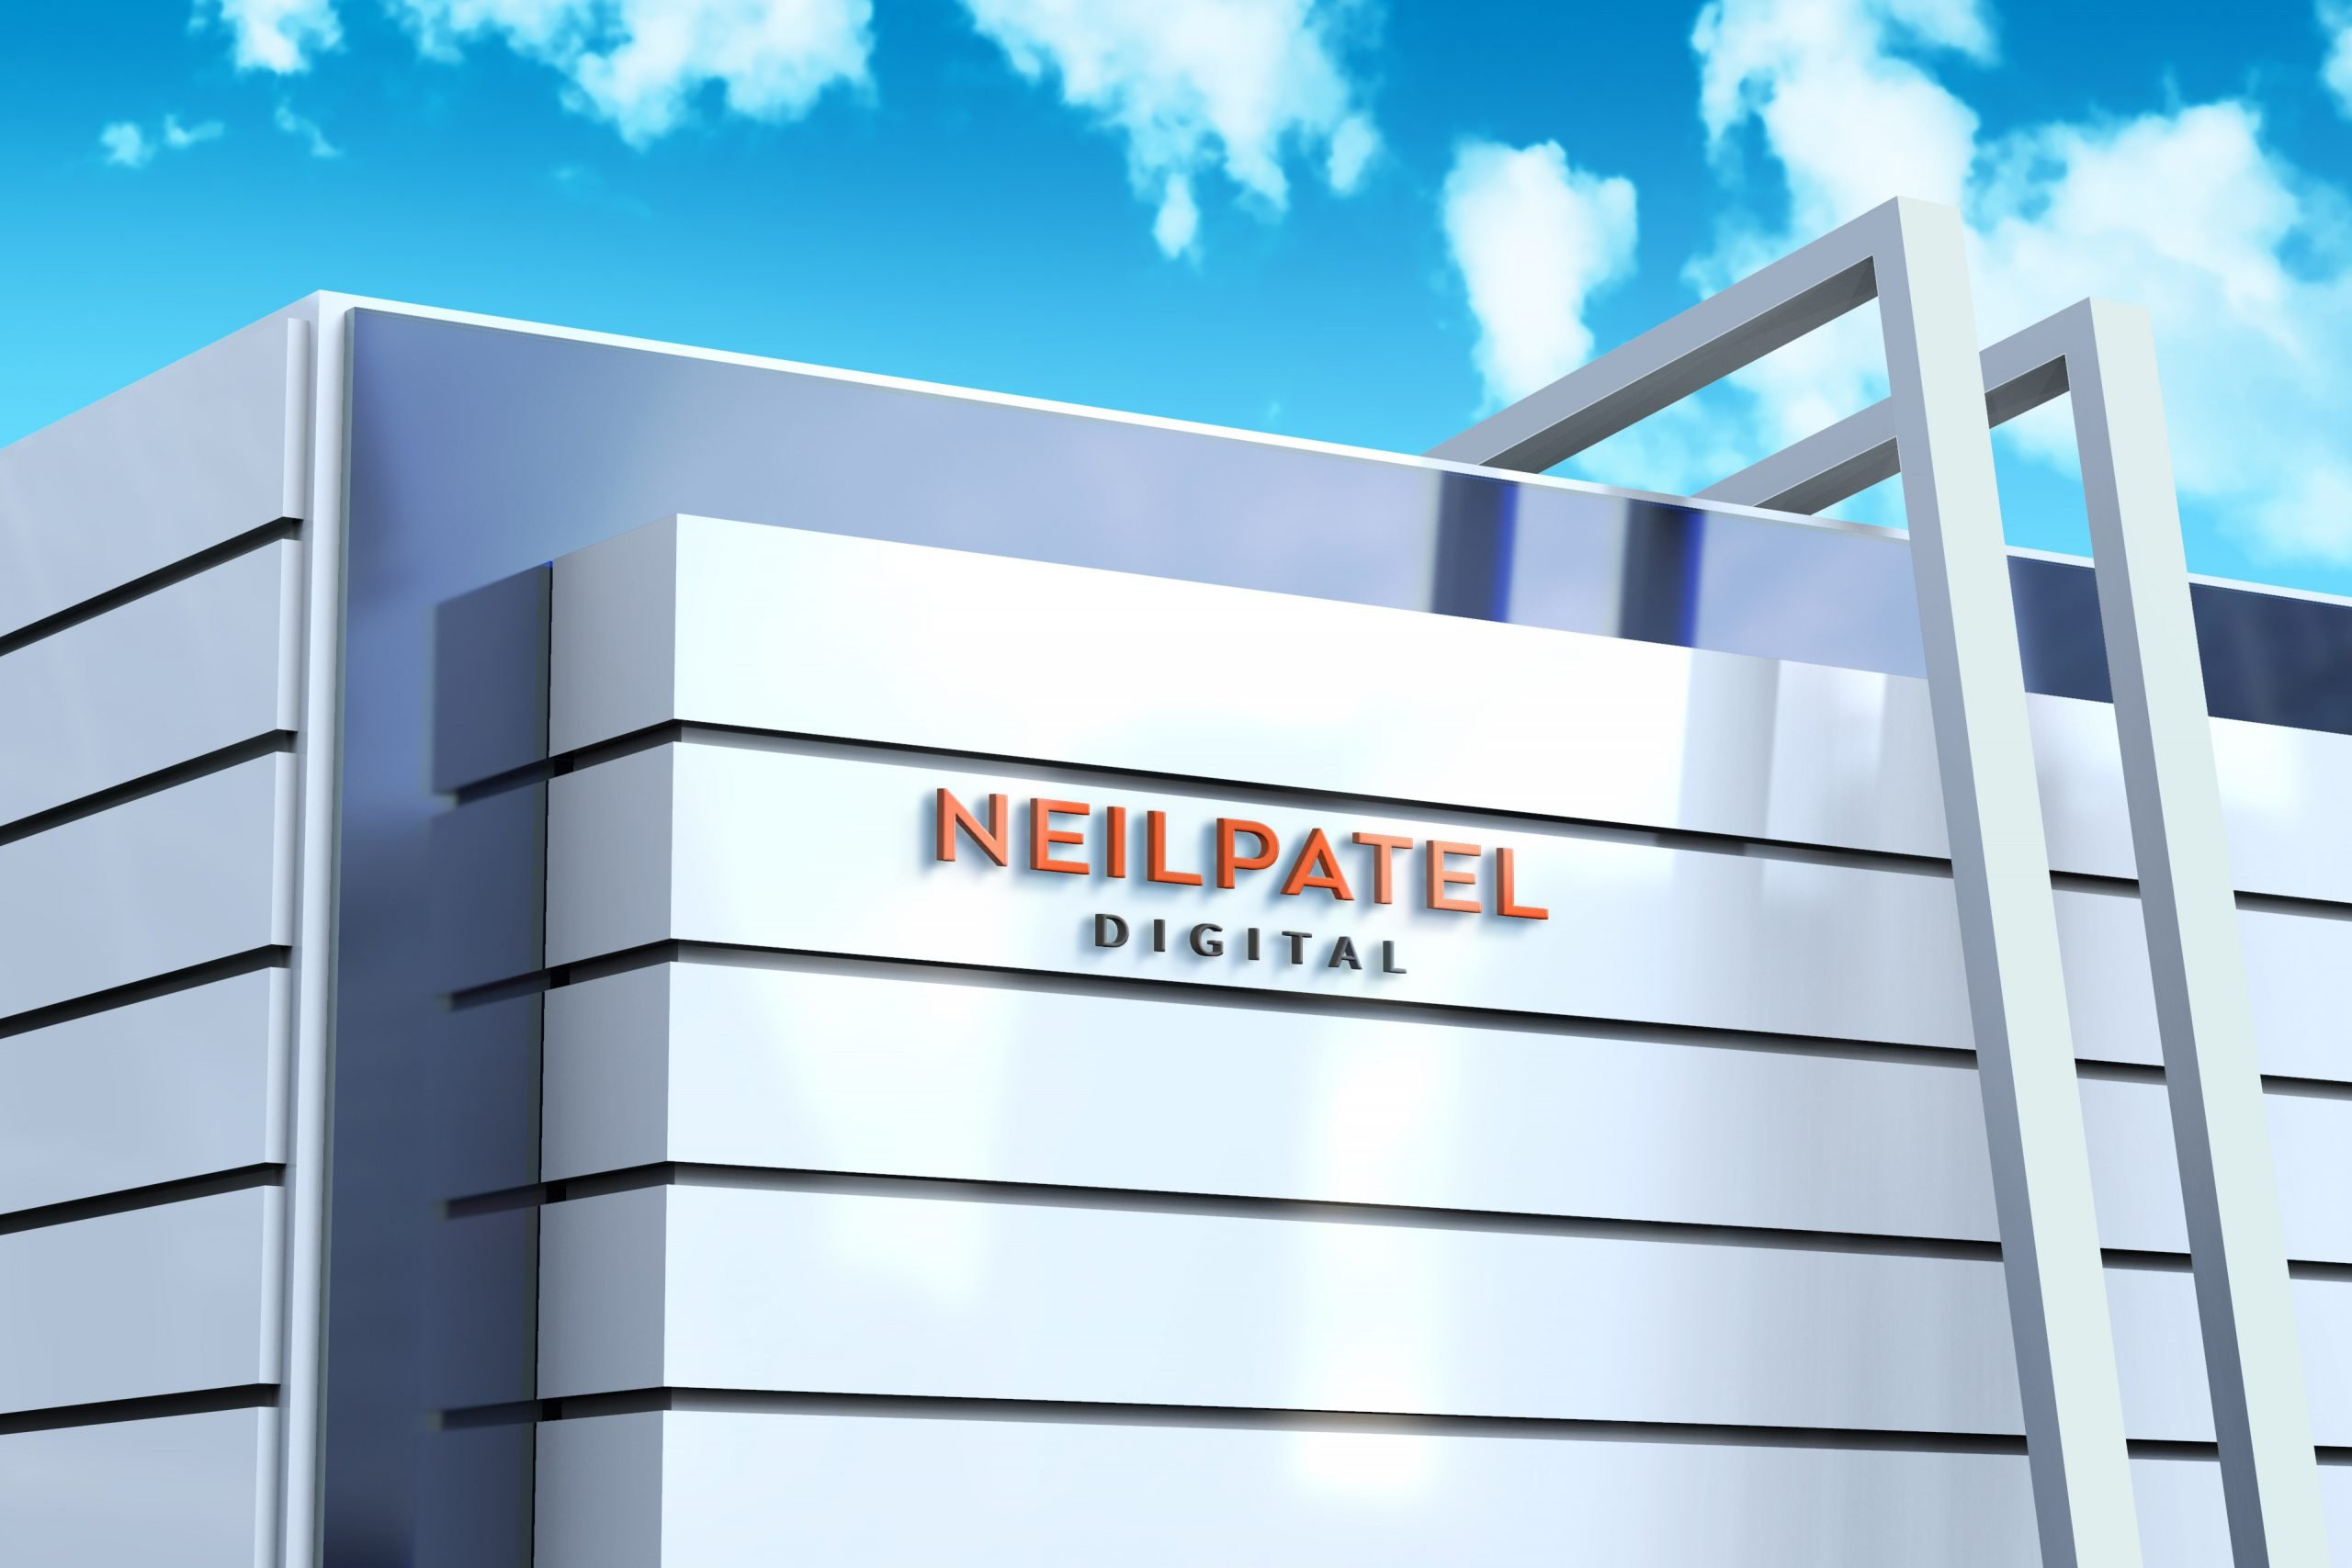 Neil-Patel-Digital-Logo-Example-on-Modern-Building-Architecture-Logo-Mockup